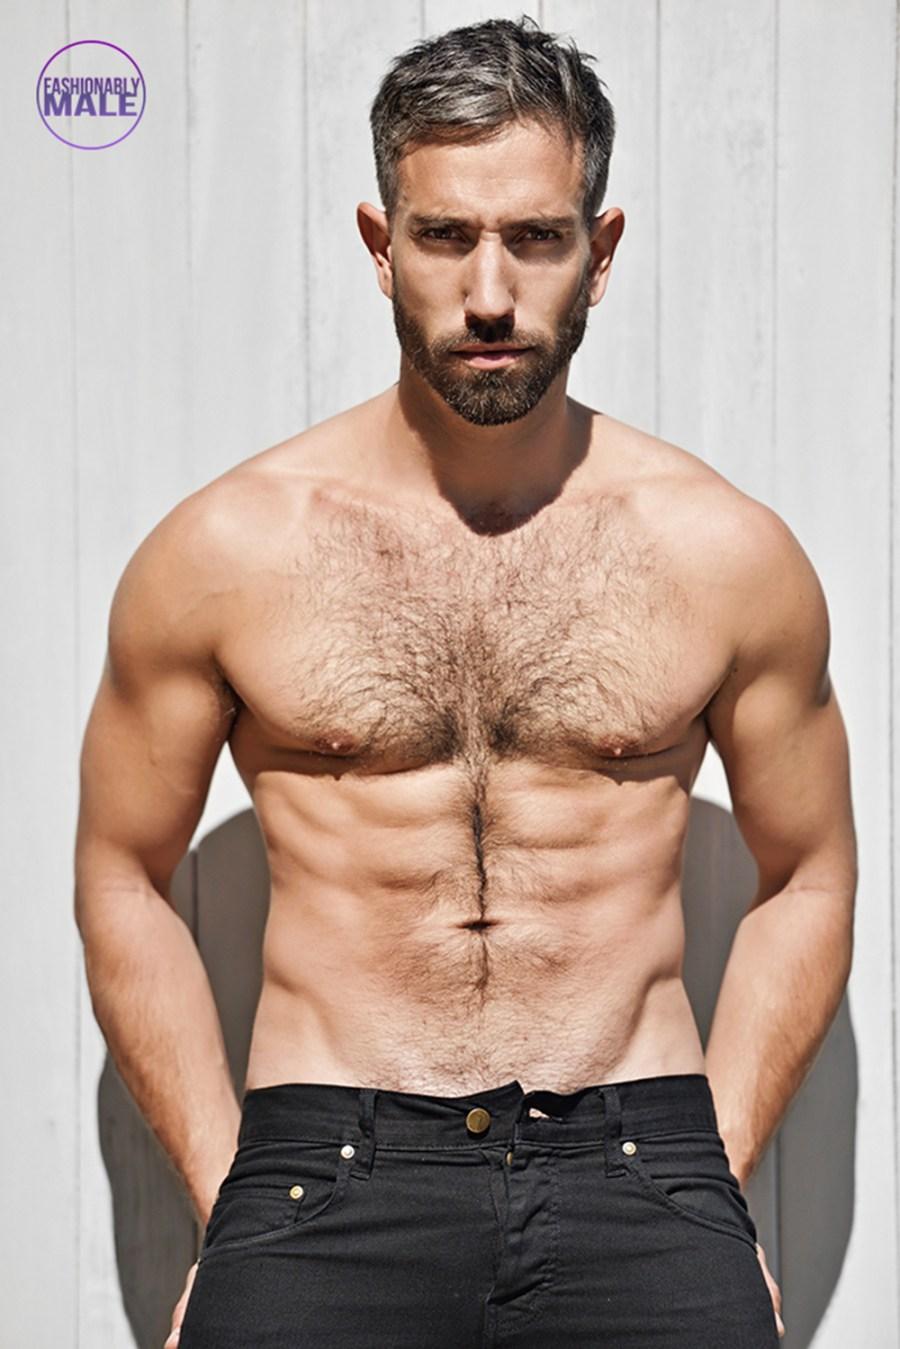 Stephane Marti by Shotsbygun for Fashionably Male3